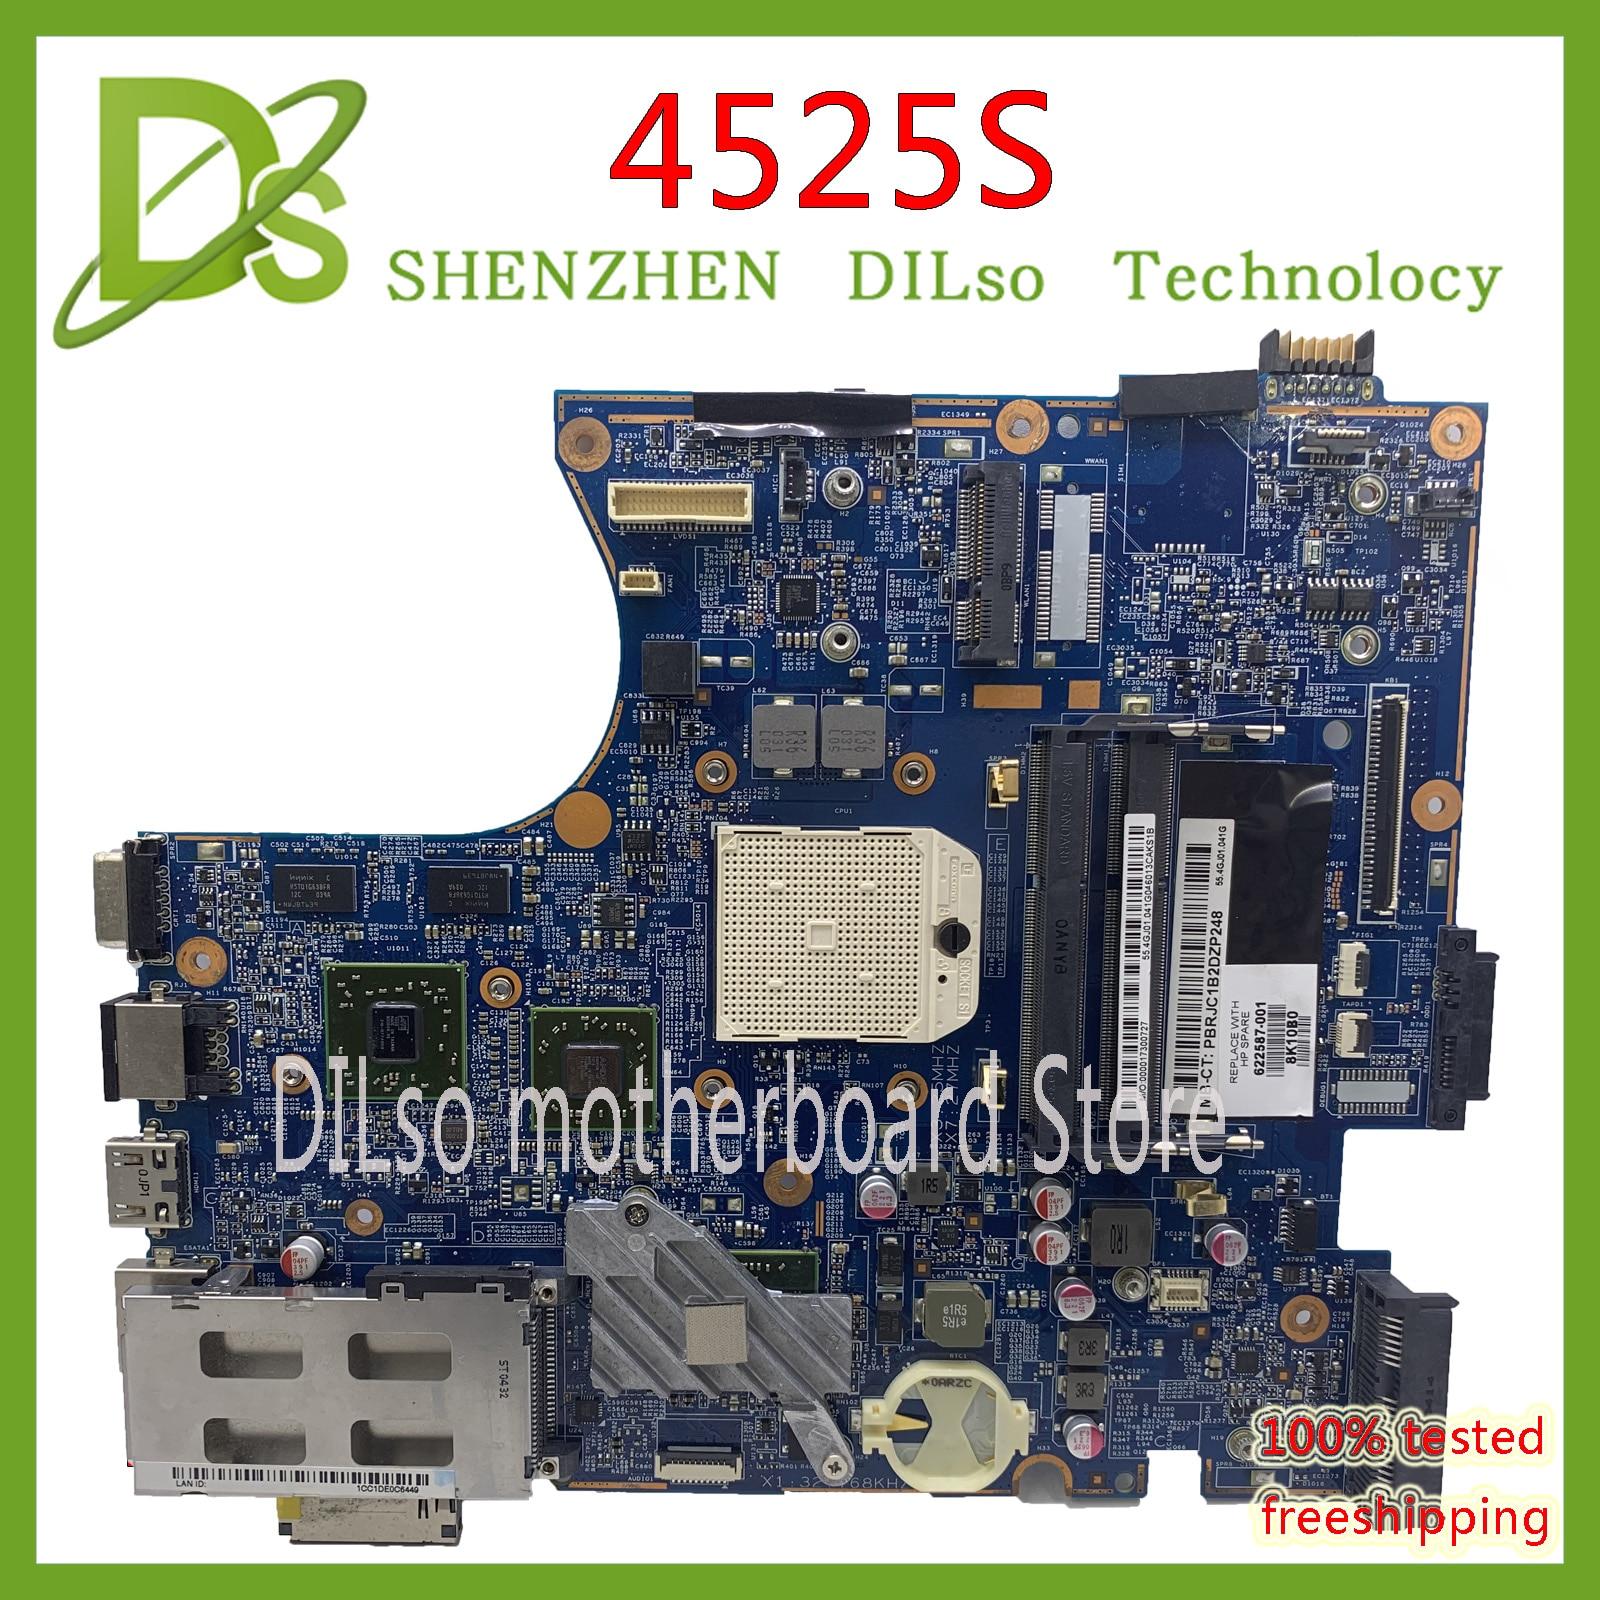 KEFU HP ProBook 4525s Motherboard 09286-1 Full TESED OK 100% Original